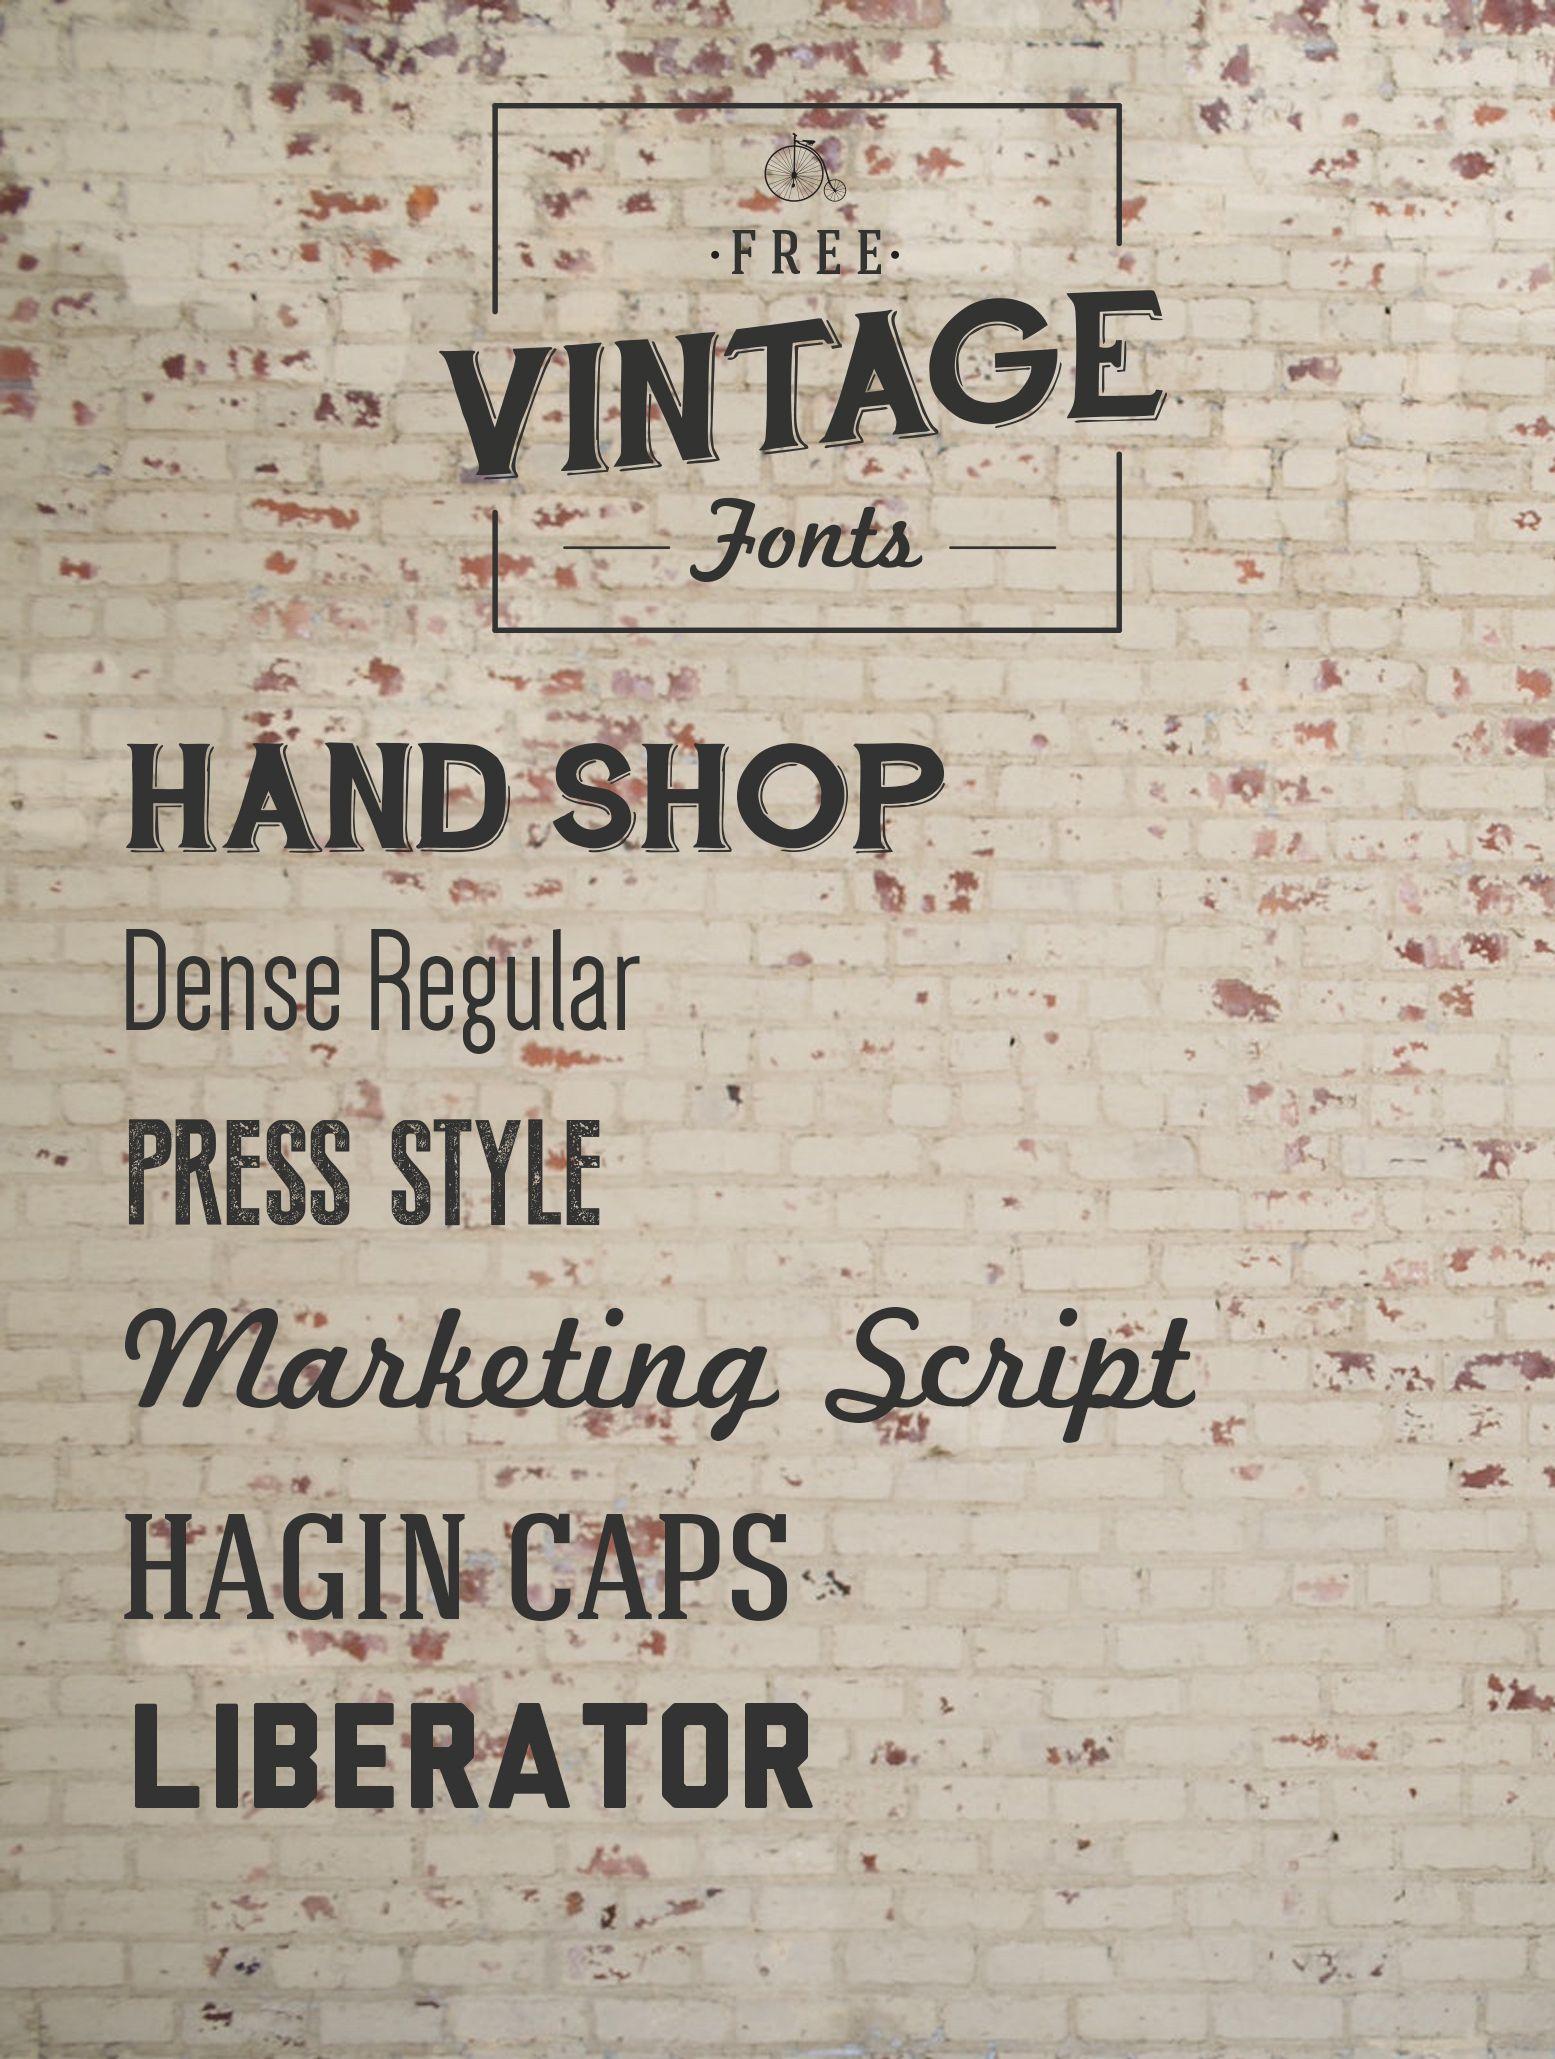 Free Vintage Fonts Vintage fonts, Vintage typography